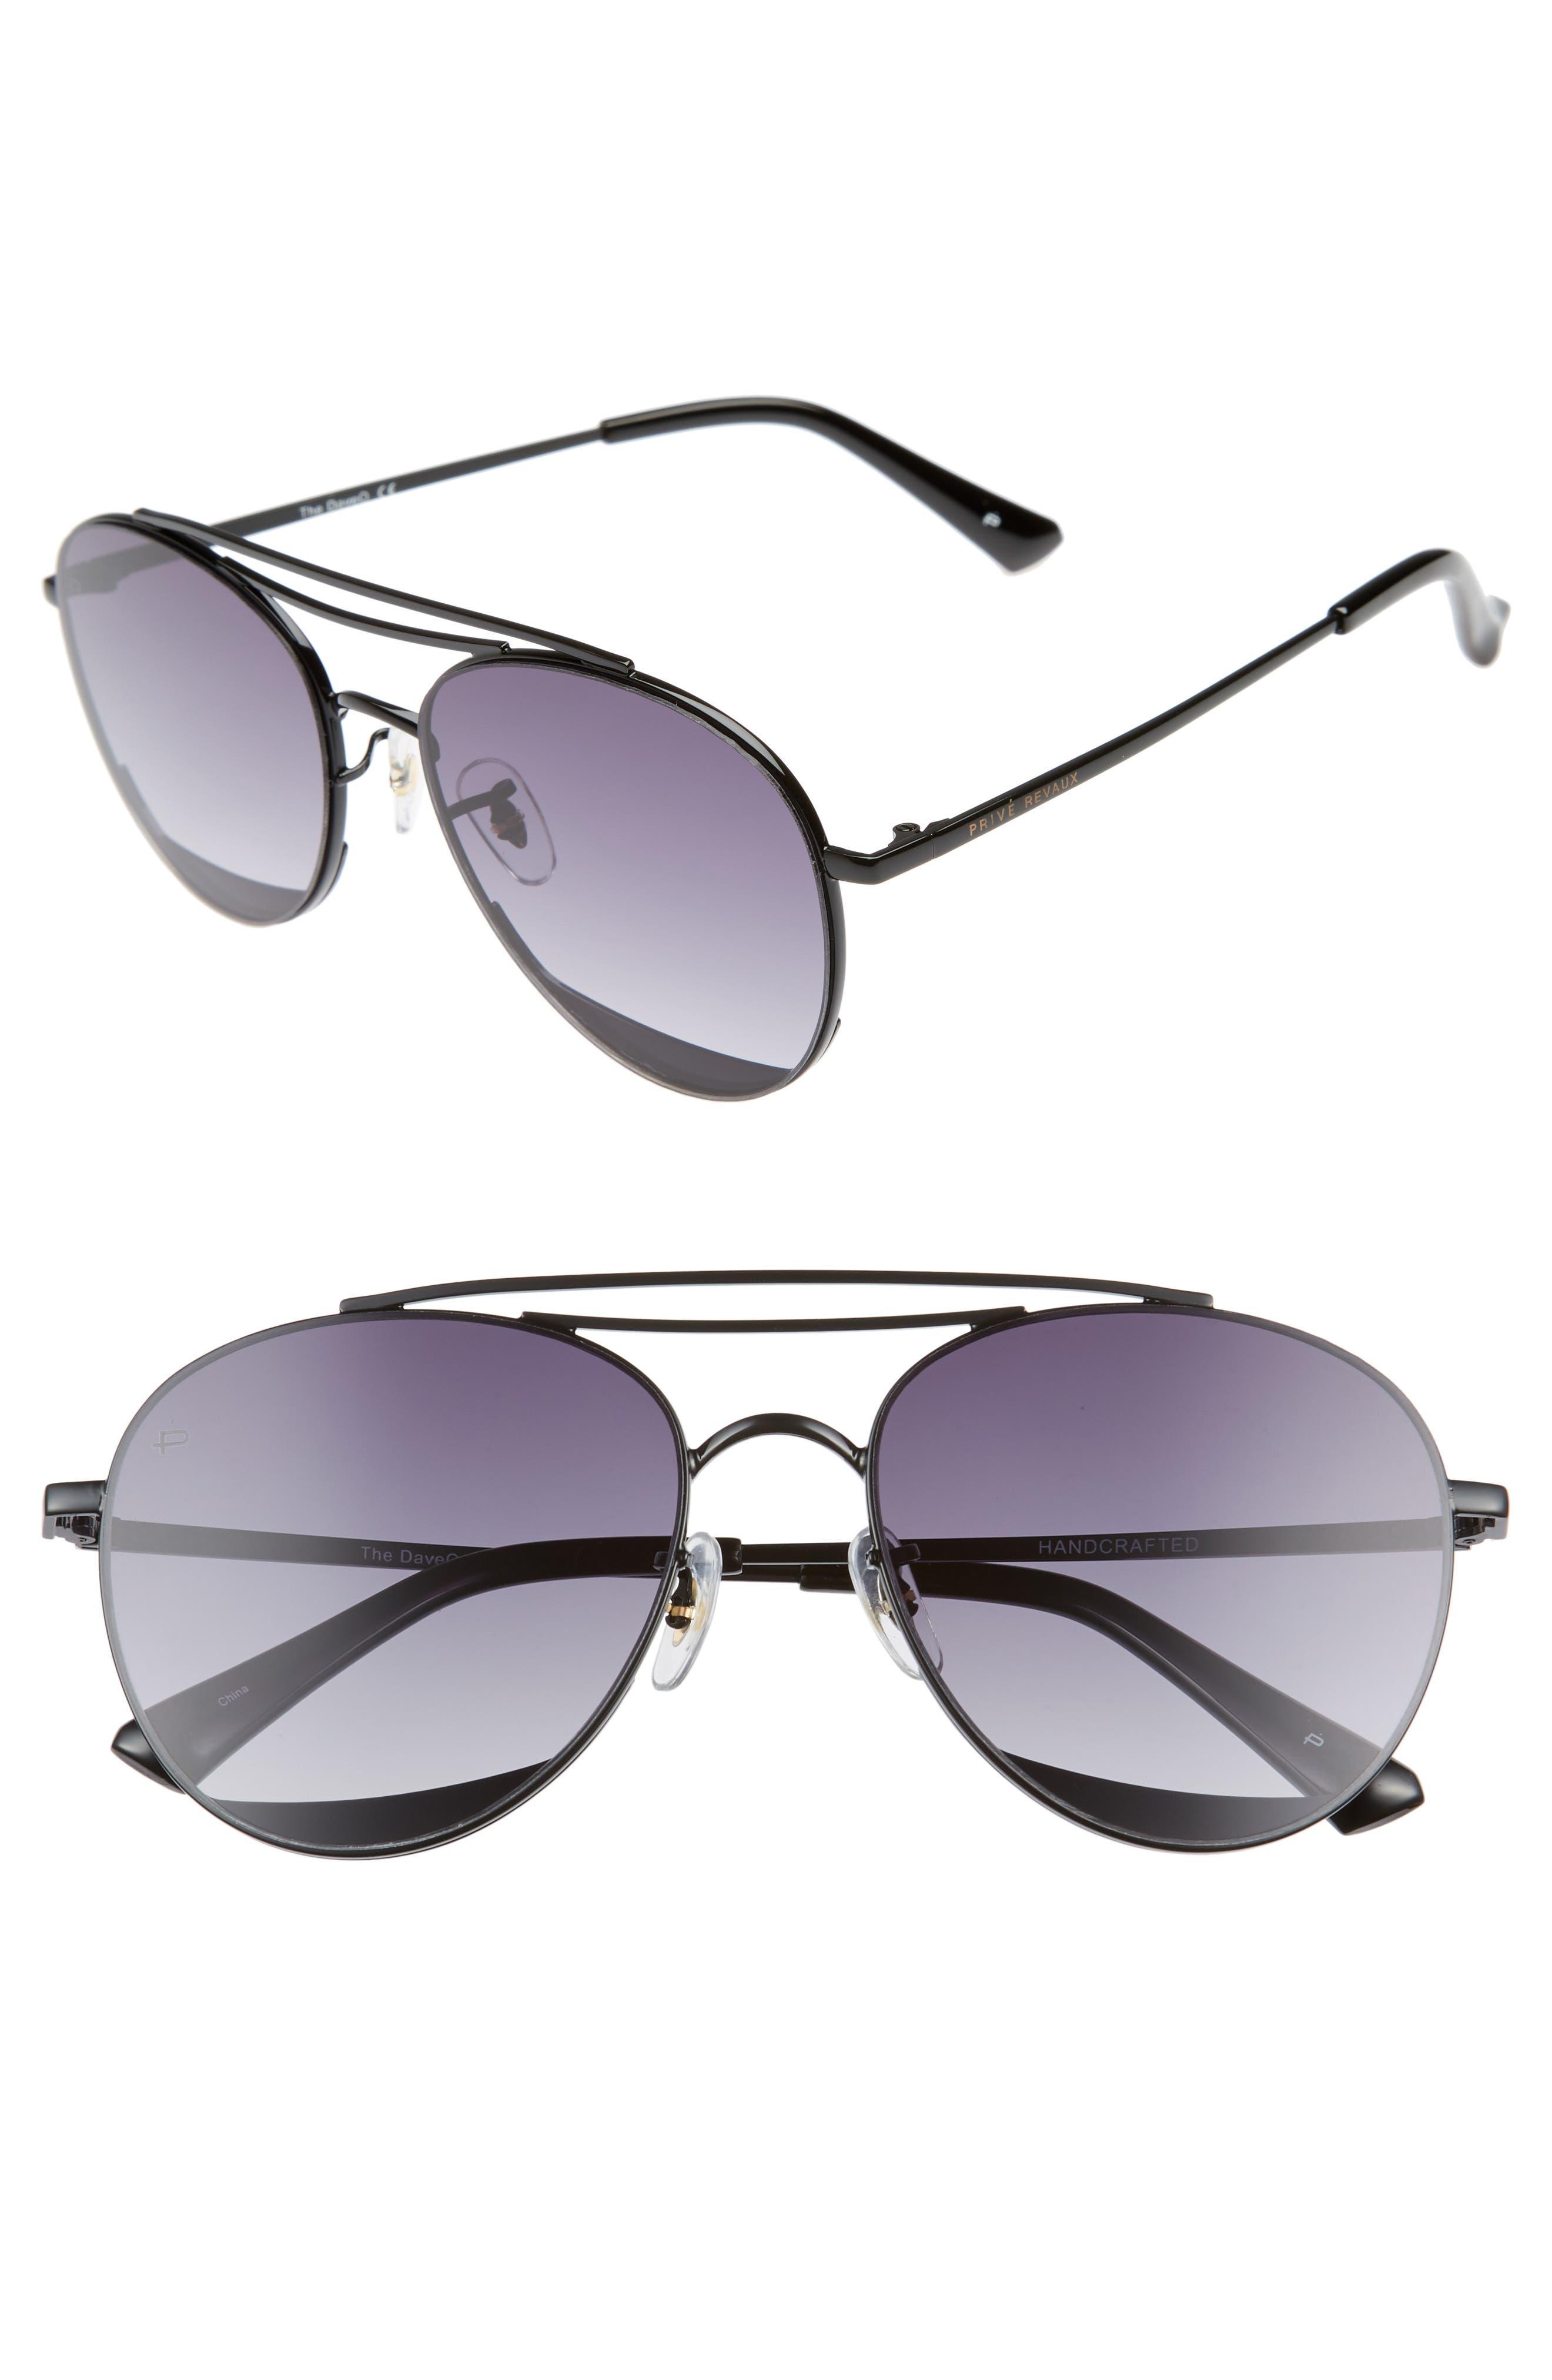 Privé Revaux The Dave O 57mm Aviator Sunglasses,                             Main thumbnail 1, color,                             Black/ Purple